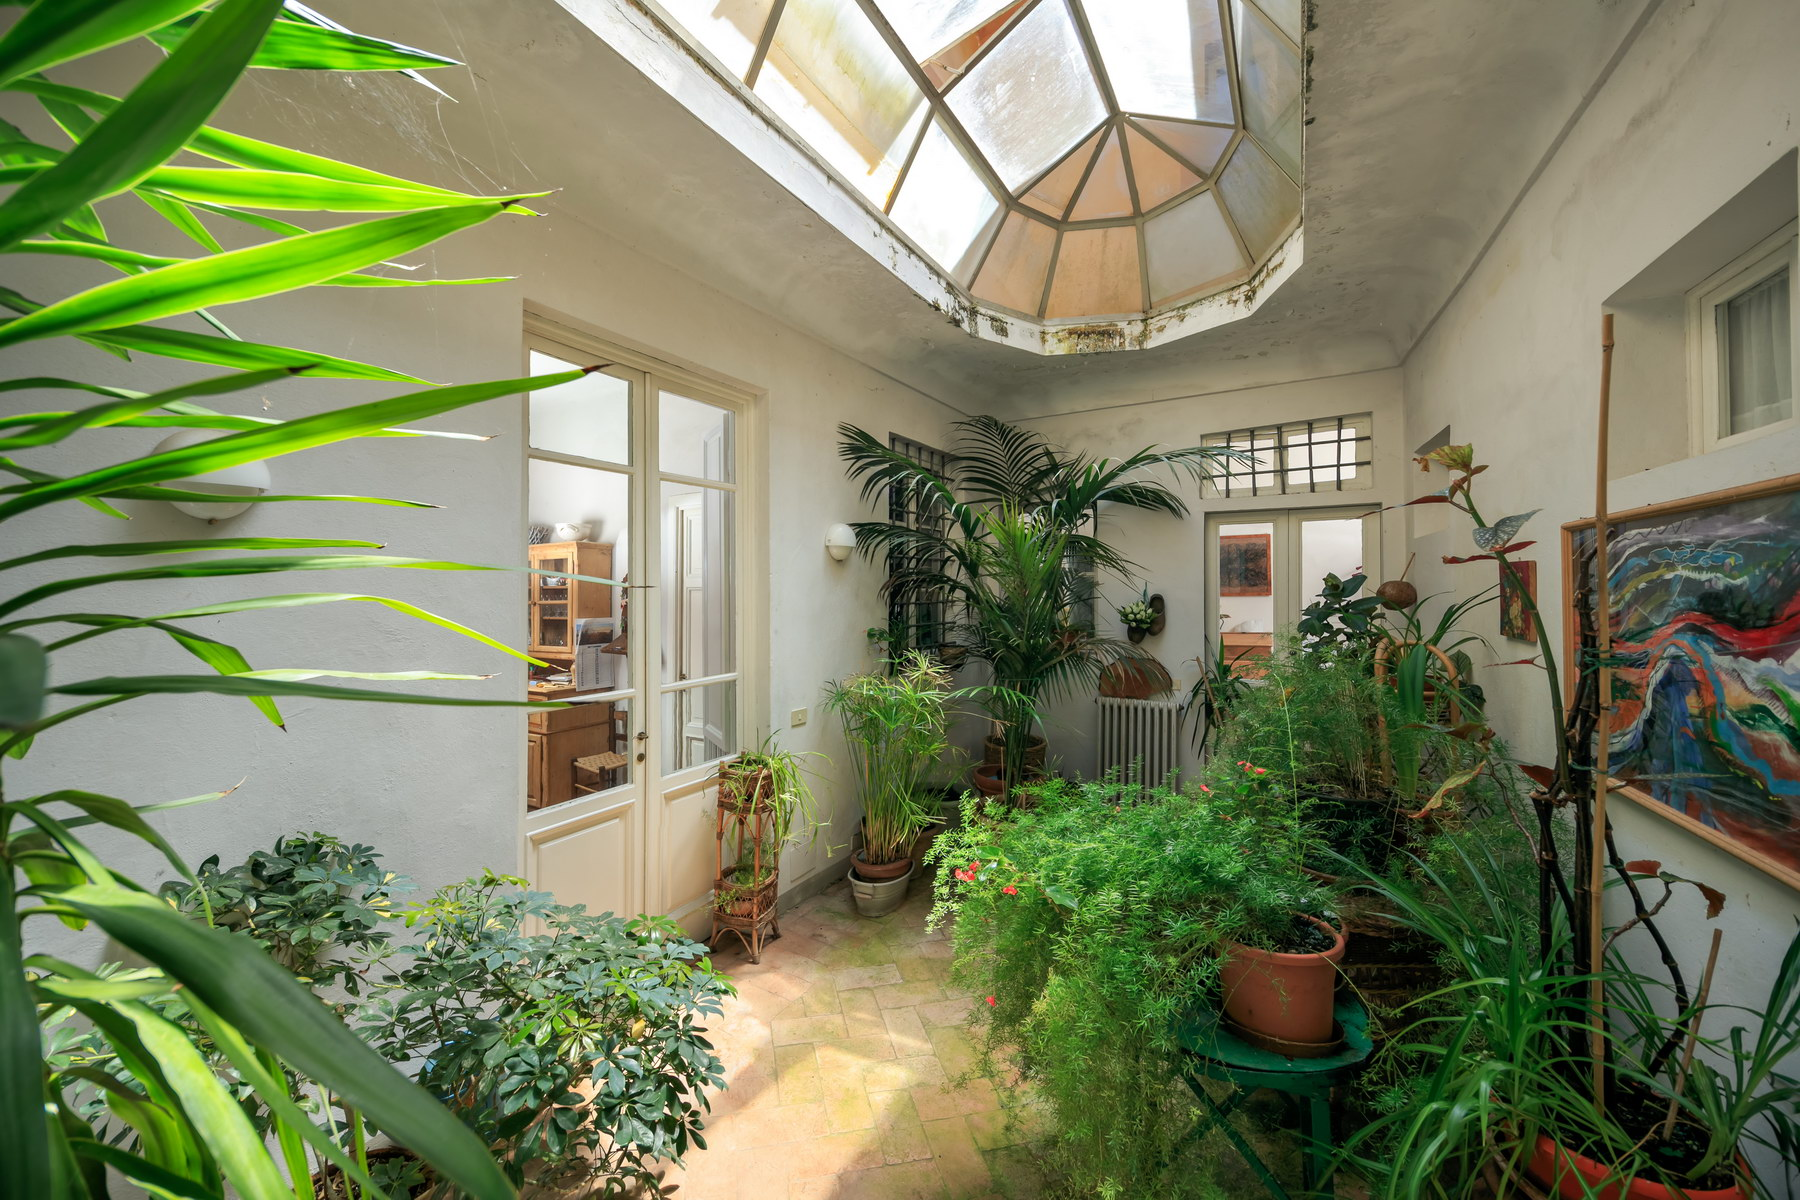 Villa in Vendita a Lucca: 5 locali, 1500 mq - Foto 10